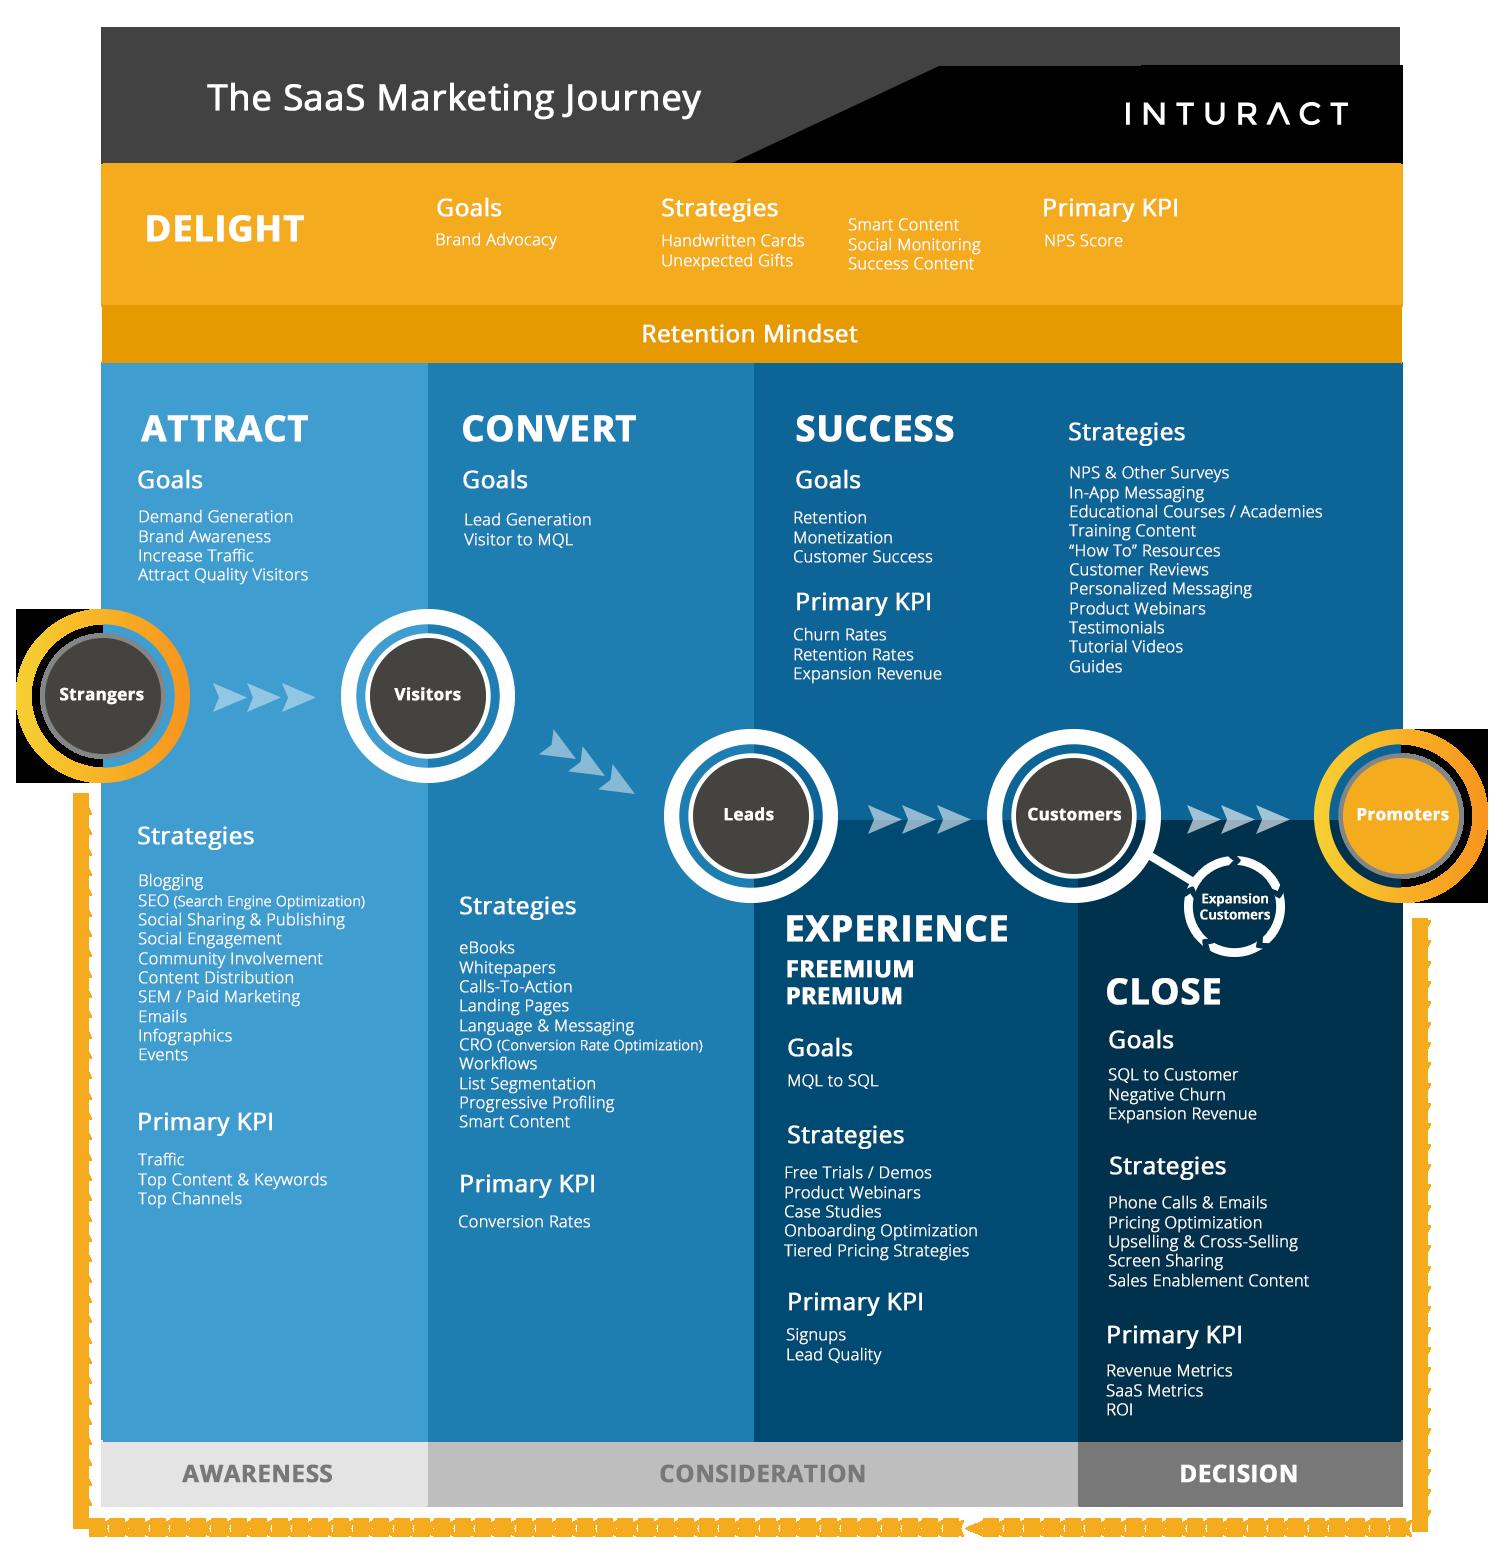 The SaaS Marketing Journey